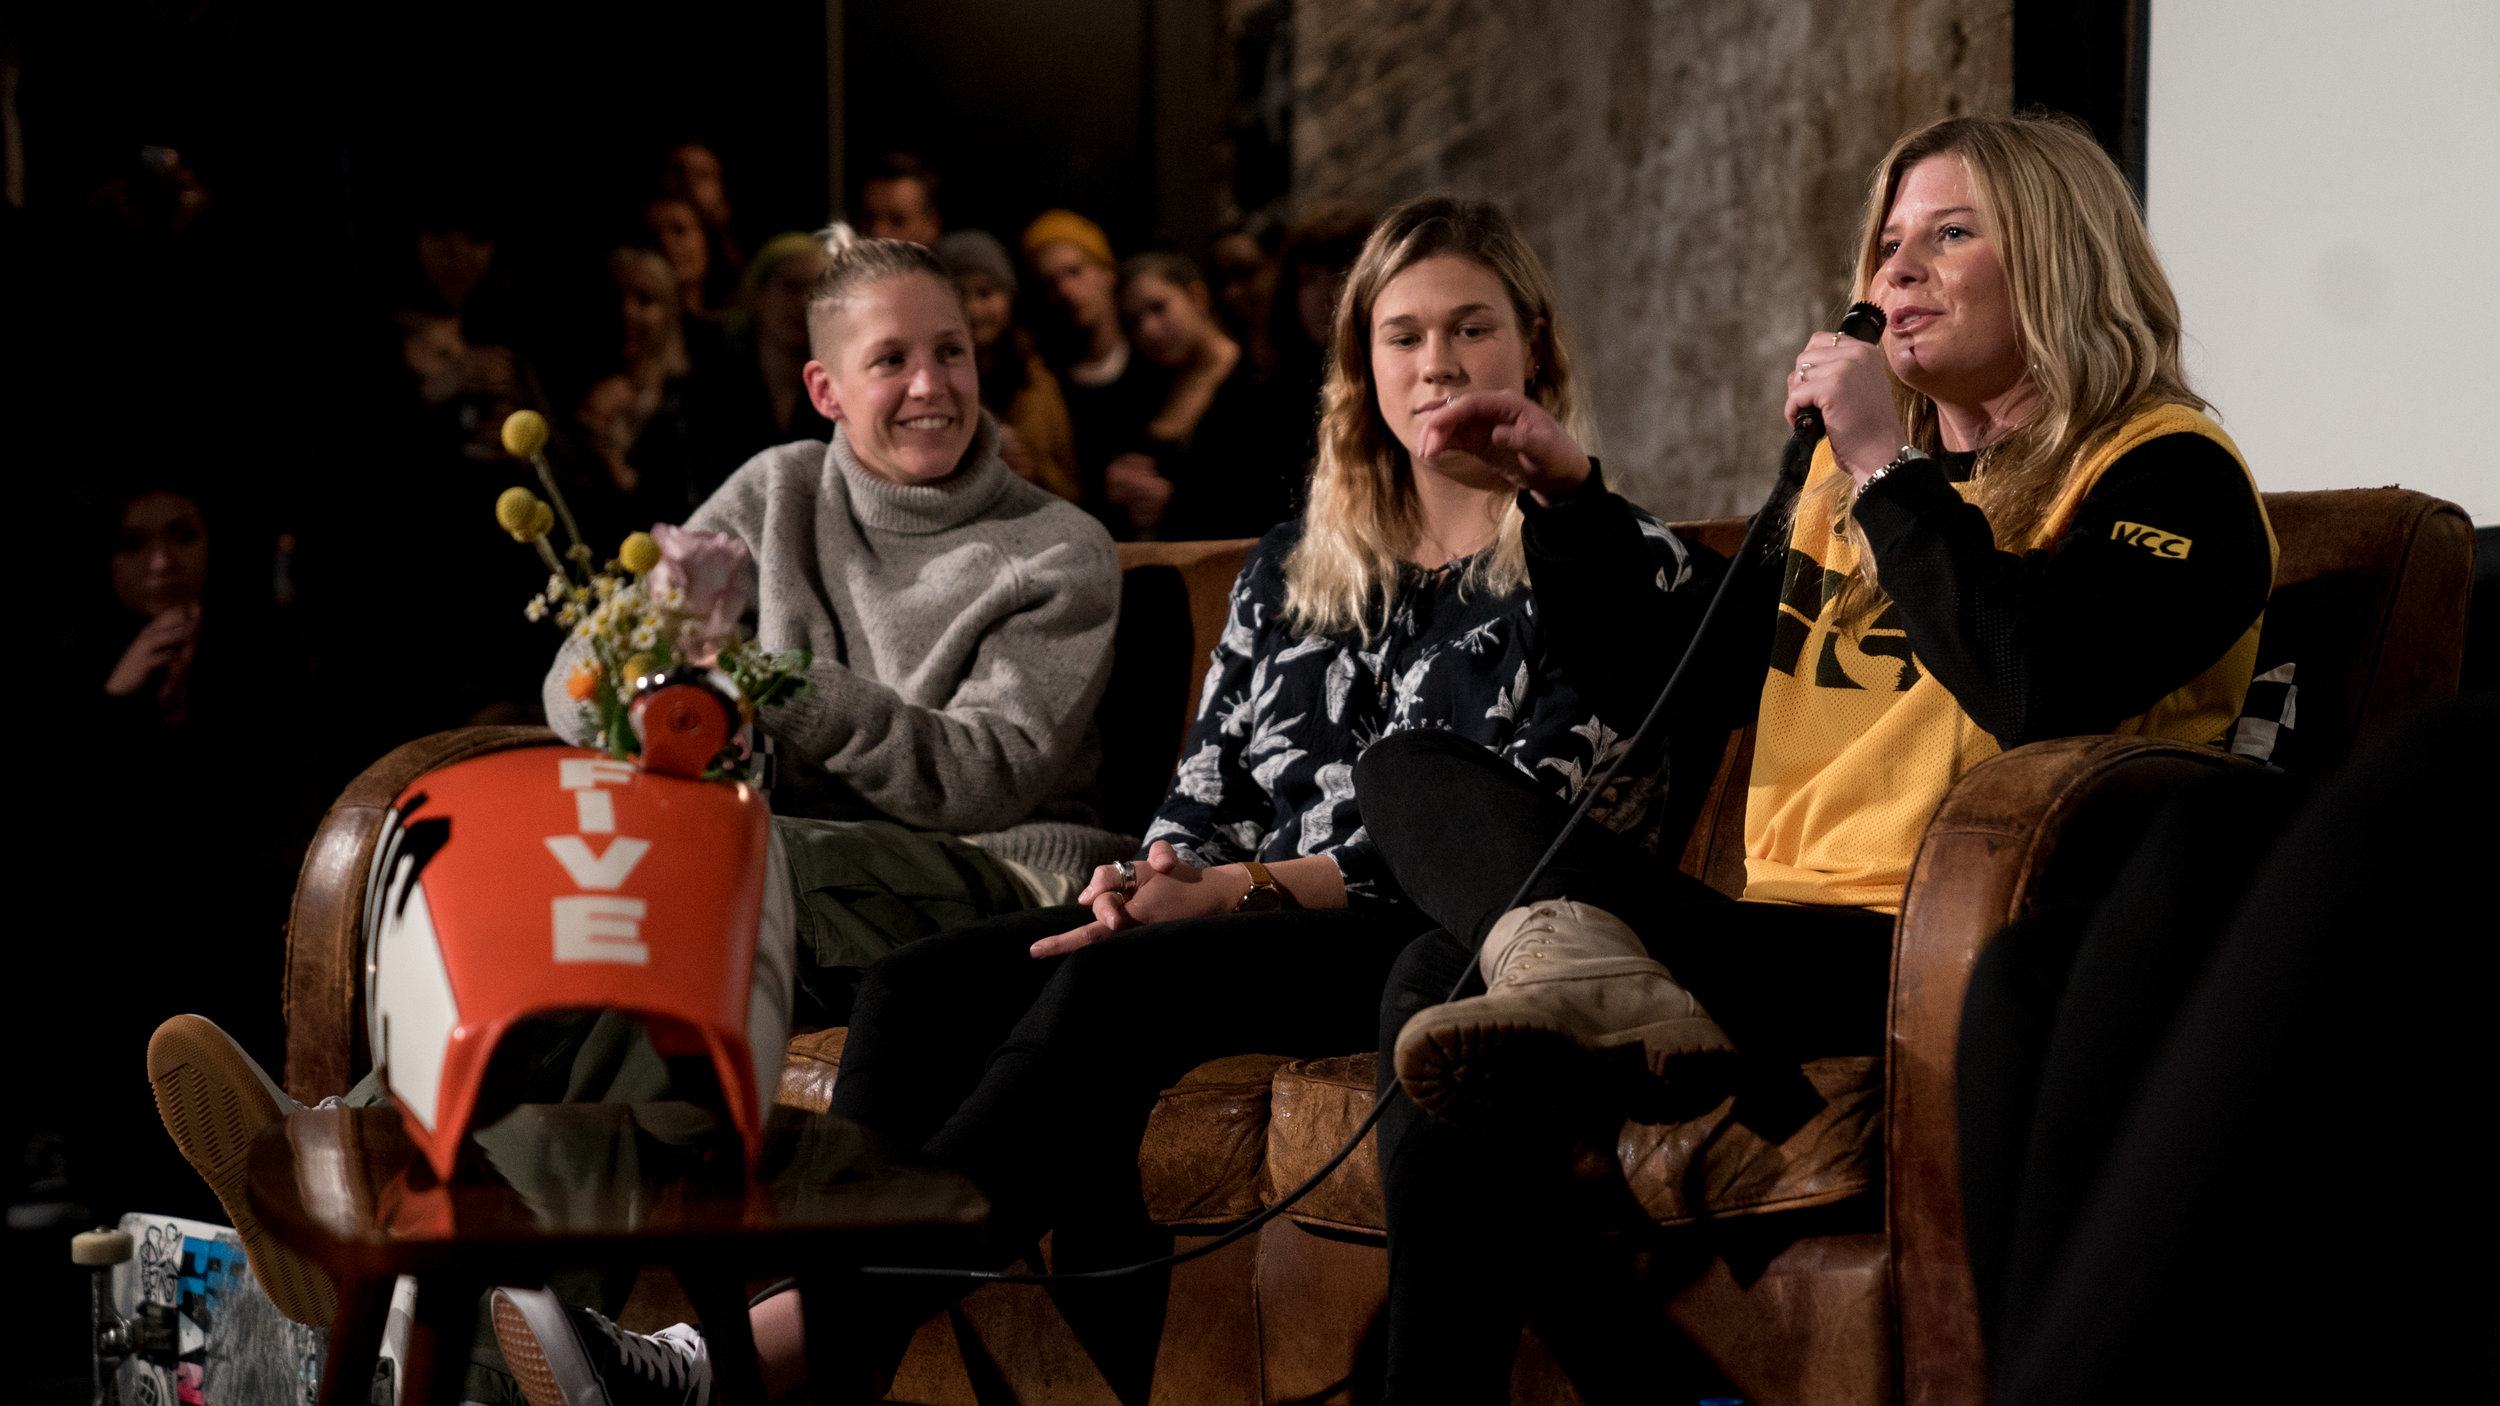 LUCY ADAMS, EMILY CURRIE & LEAH TOELOVE - VC TEAM TALKS